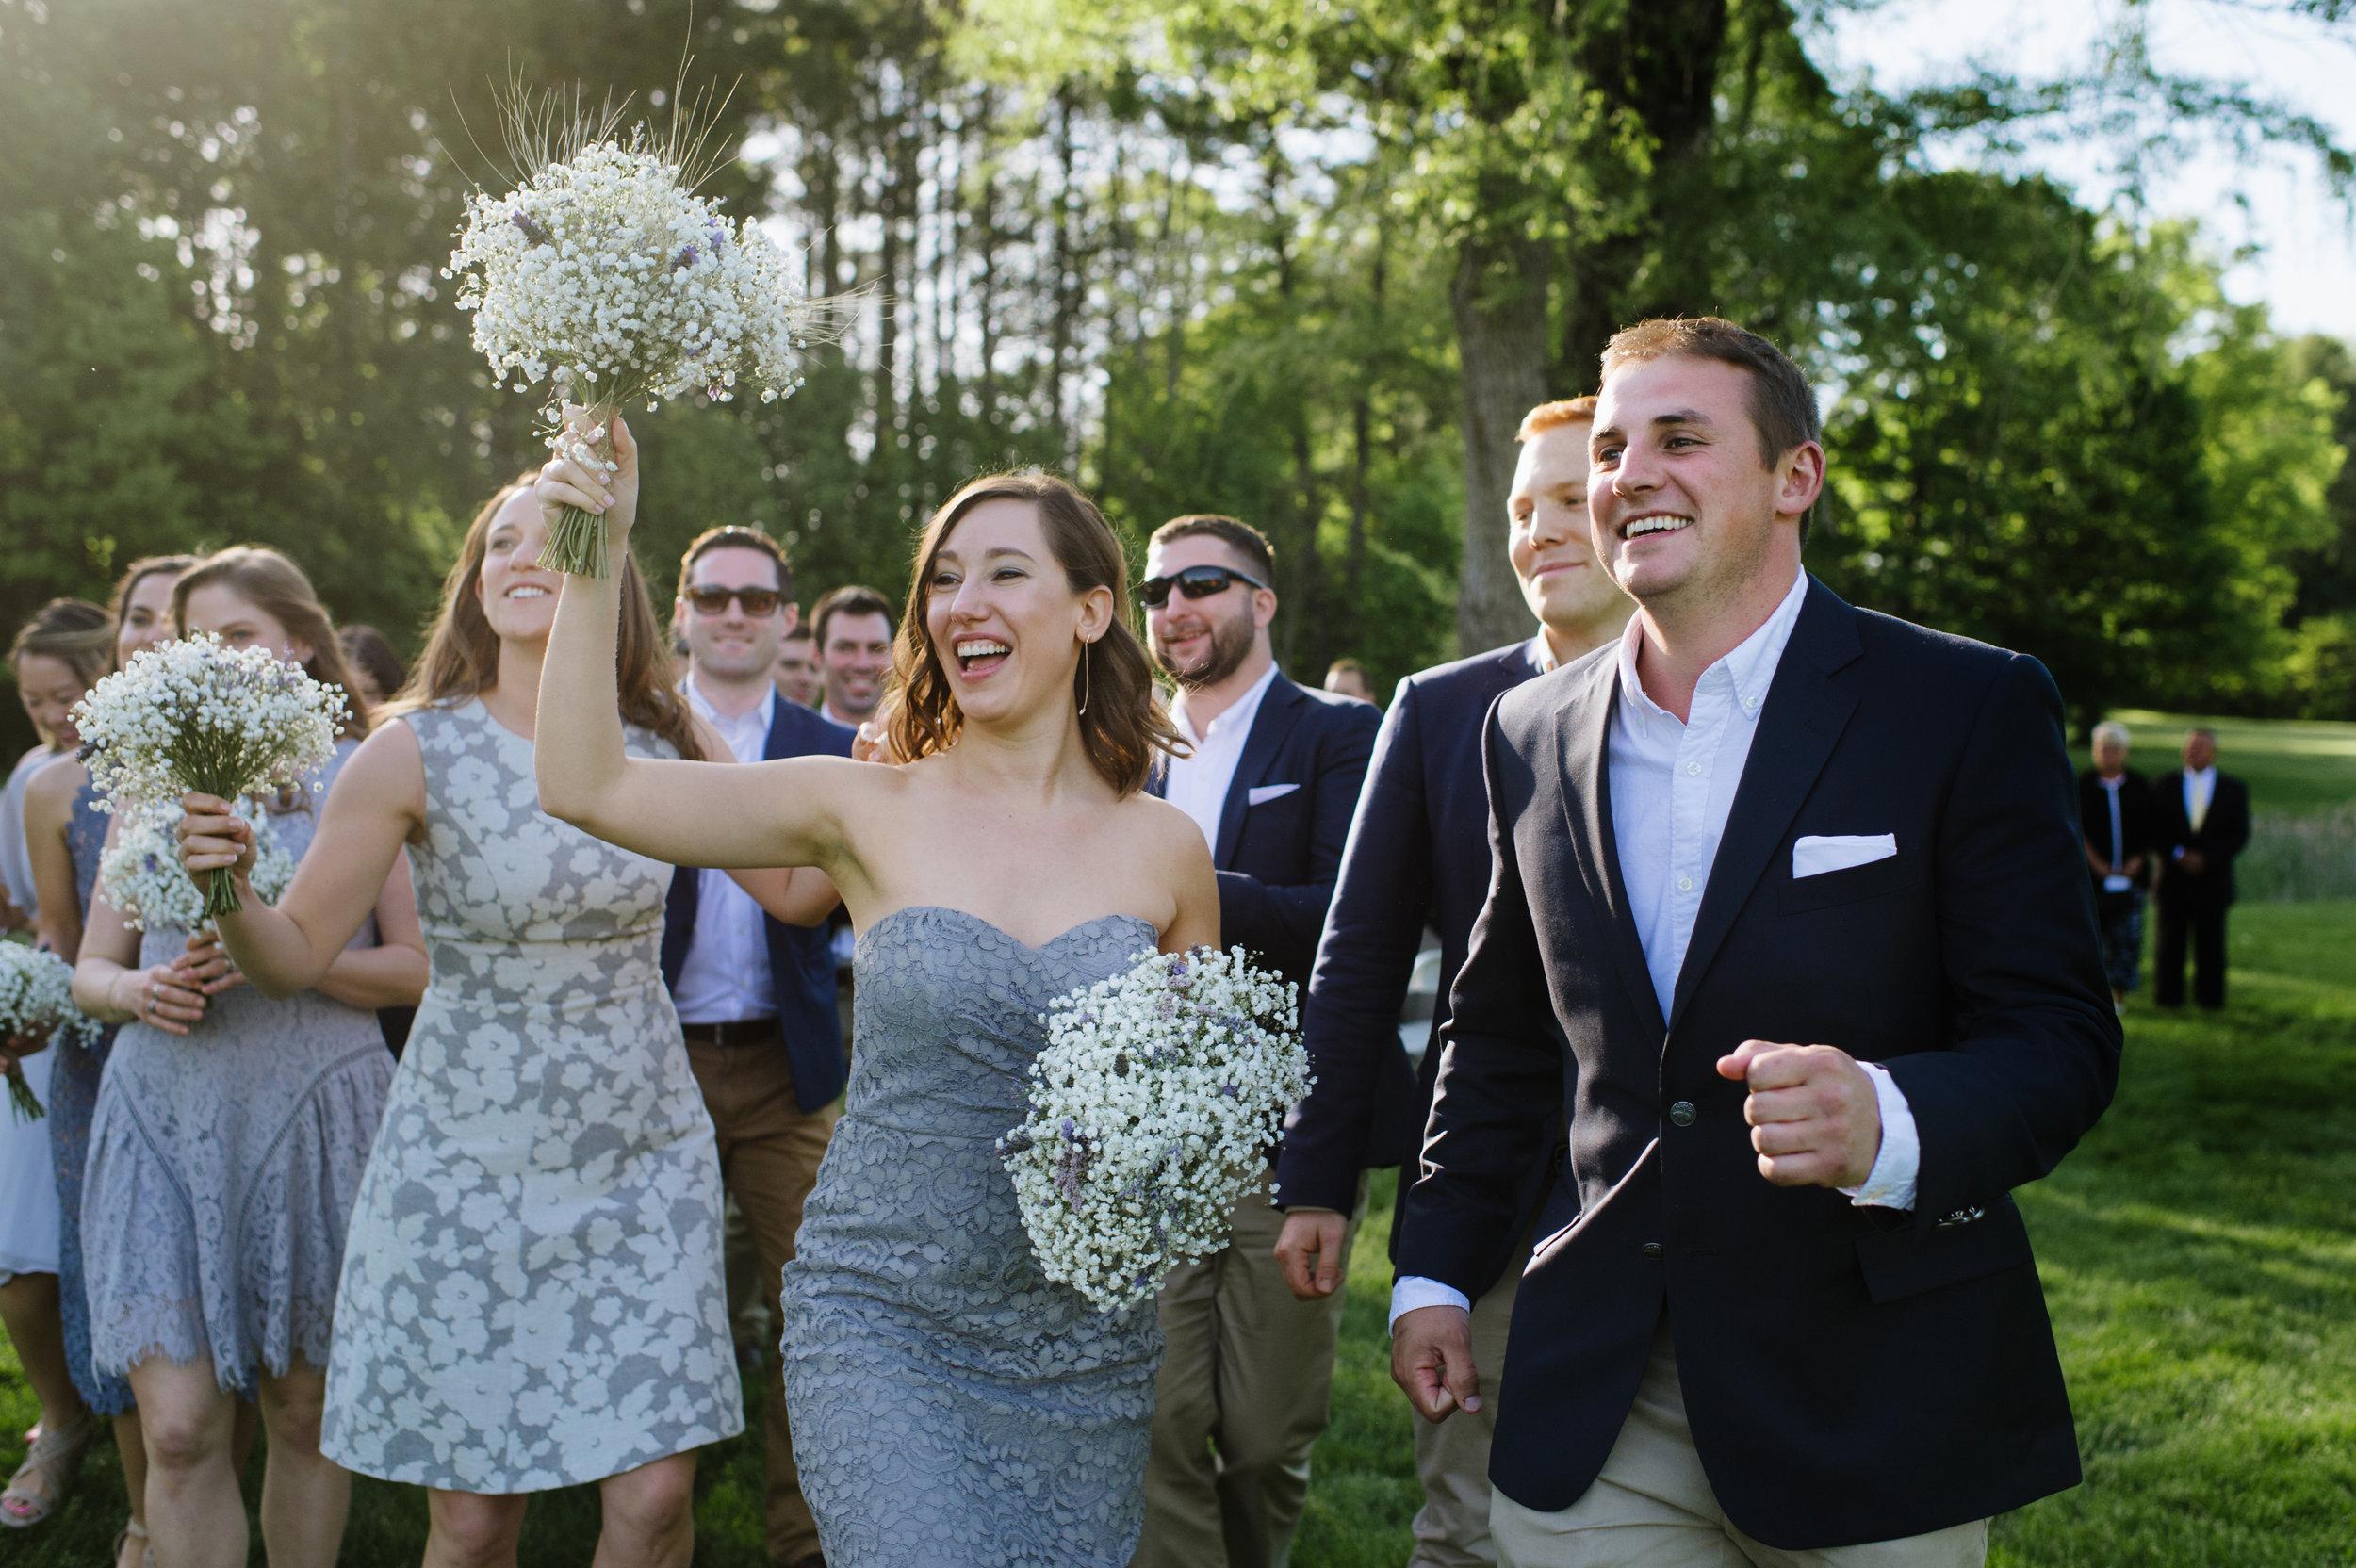 Candid-Wedding-Photography-Boston020.jpg